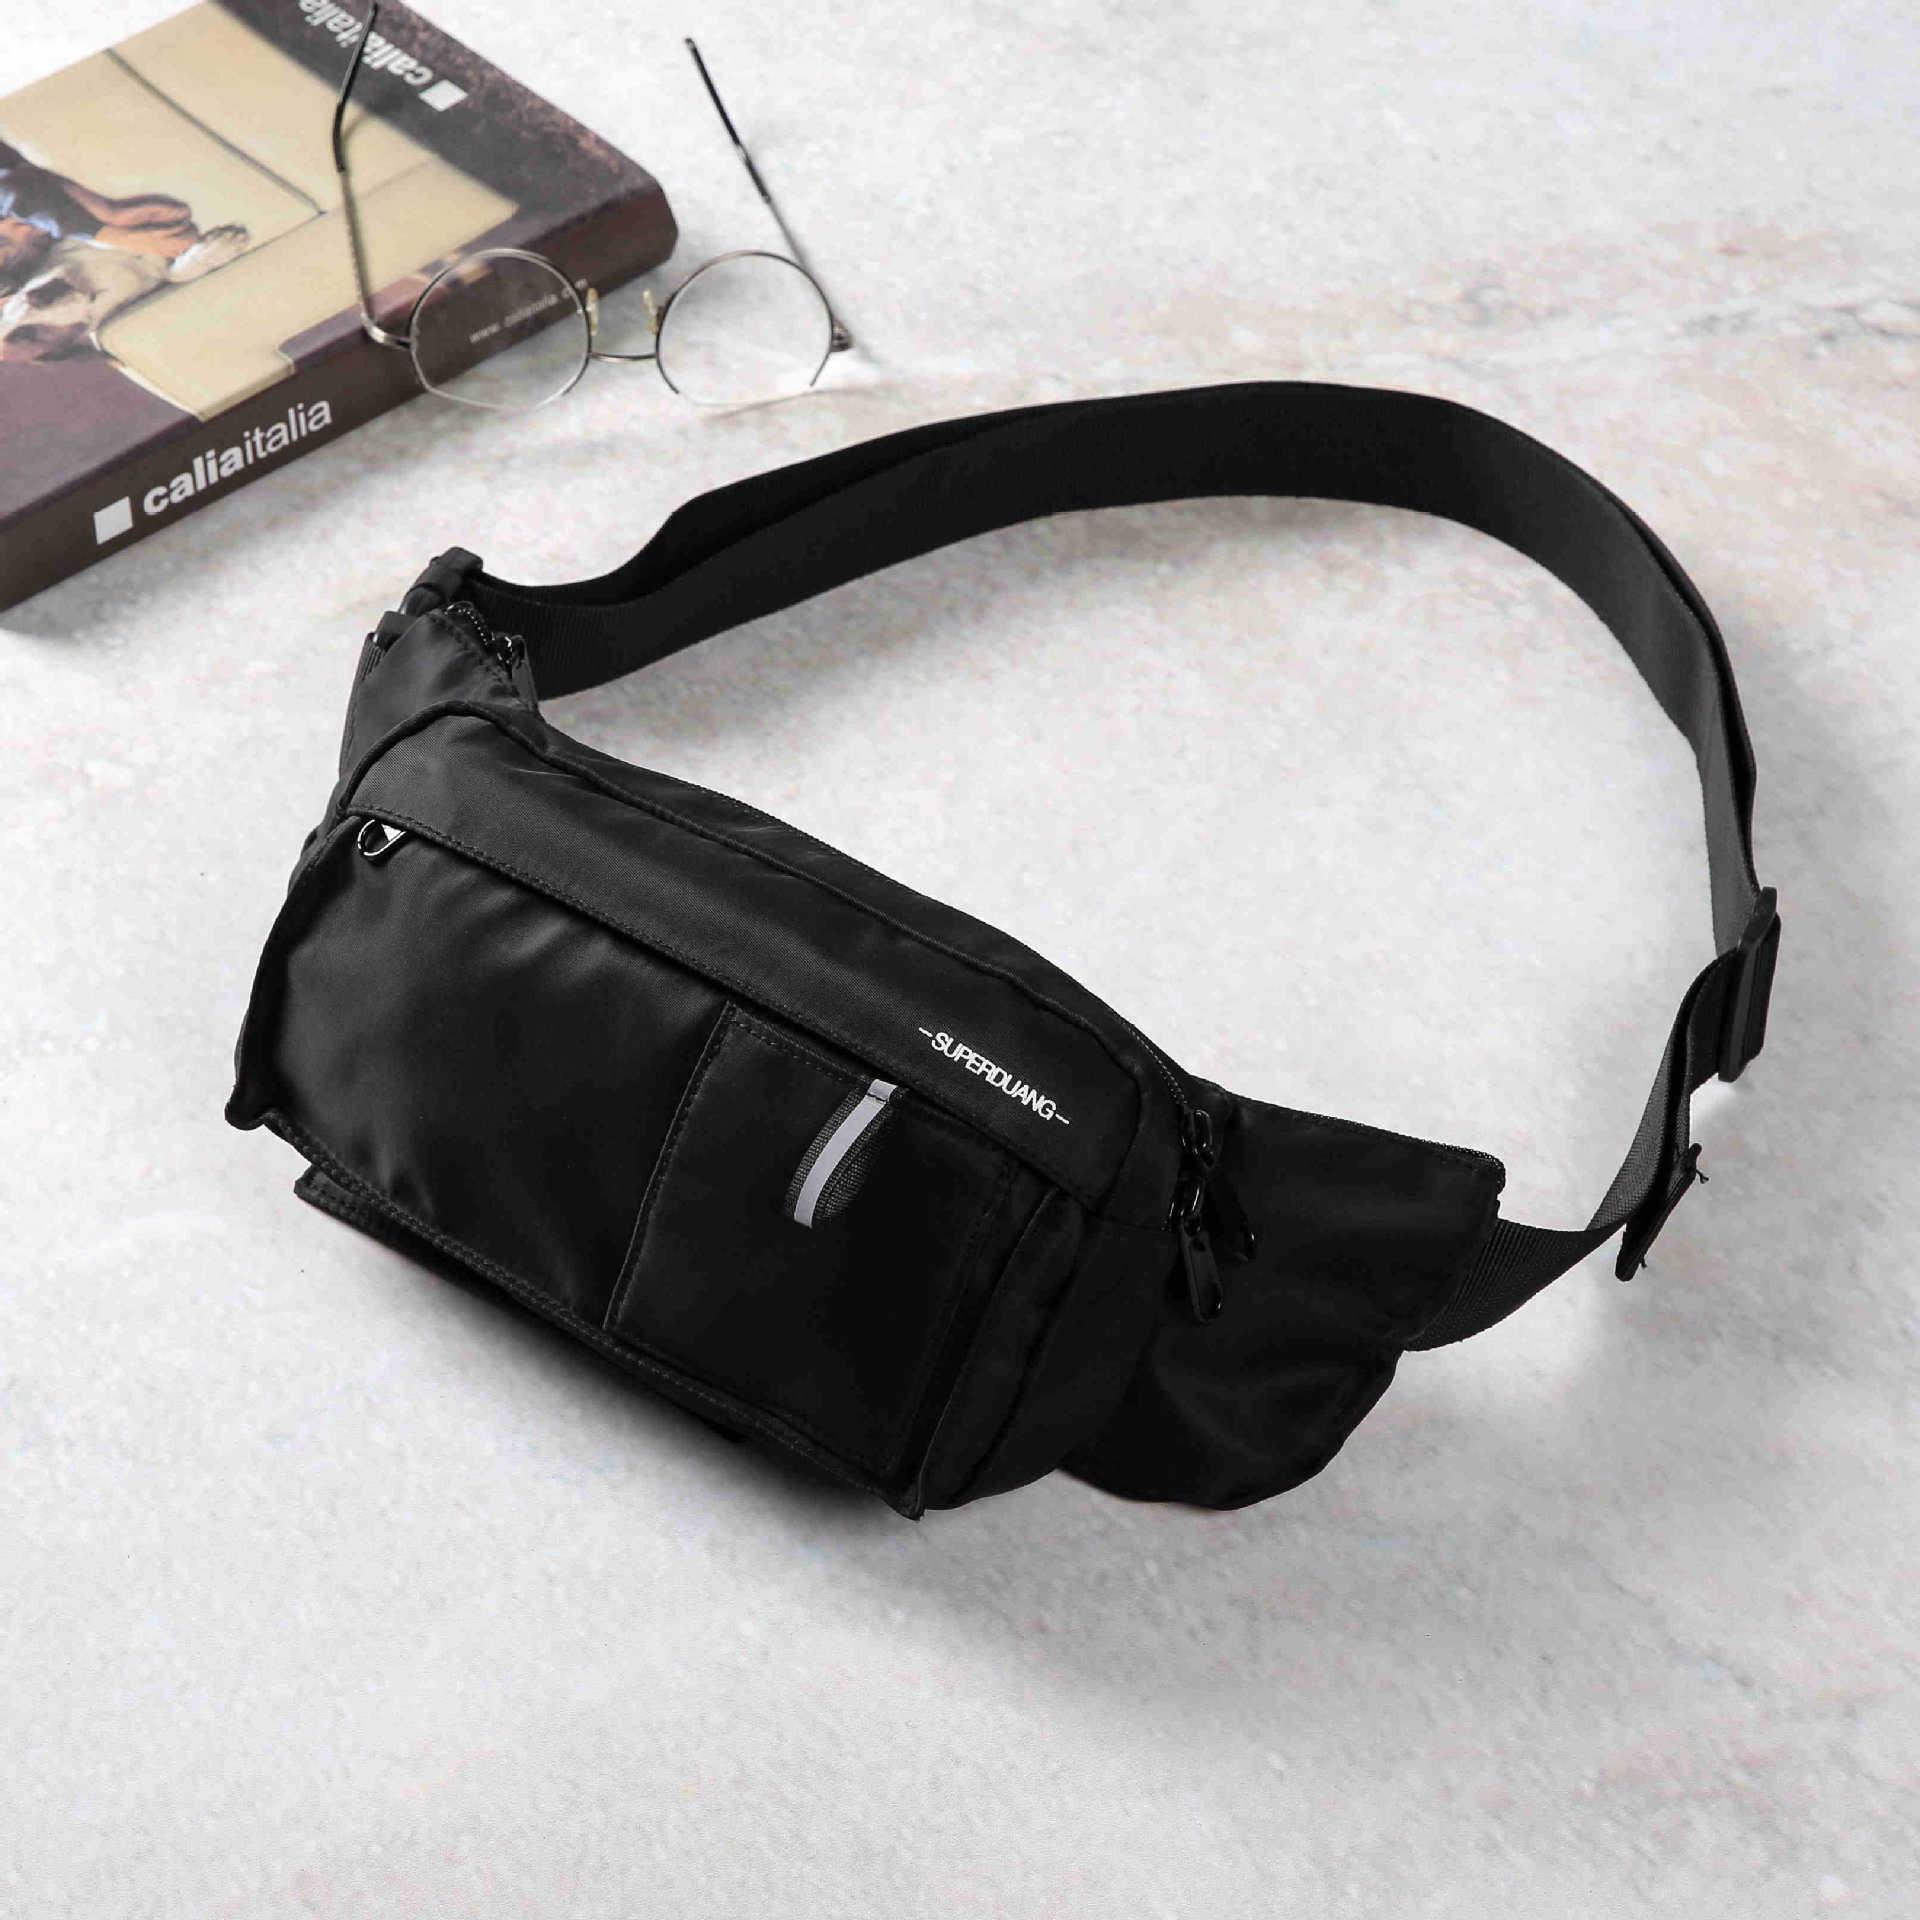 2019 Trendy Men's Fashion Leisure Sports Riding Back Satchel Chest Bag Korean Version